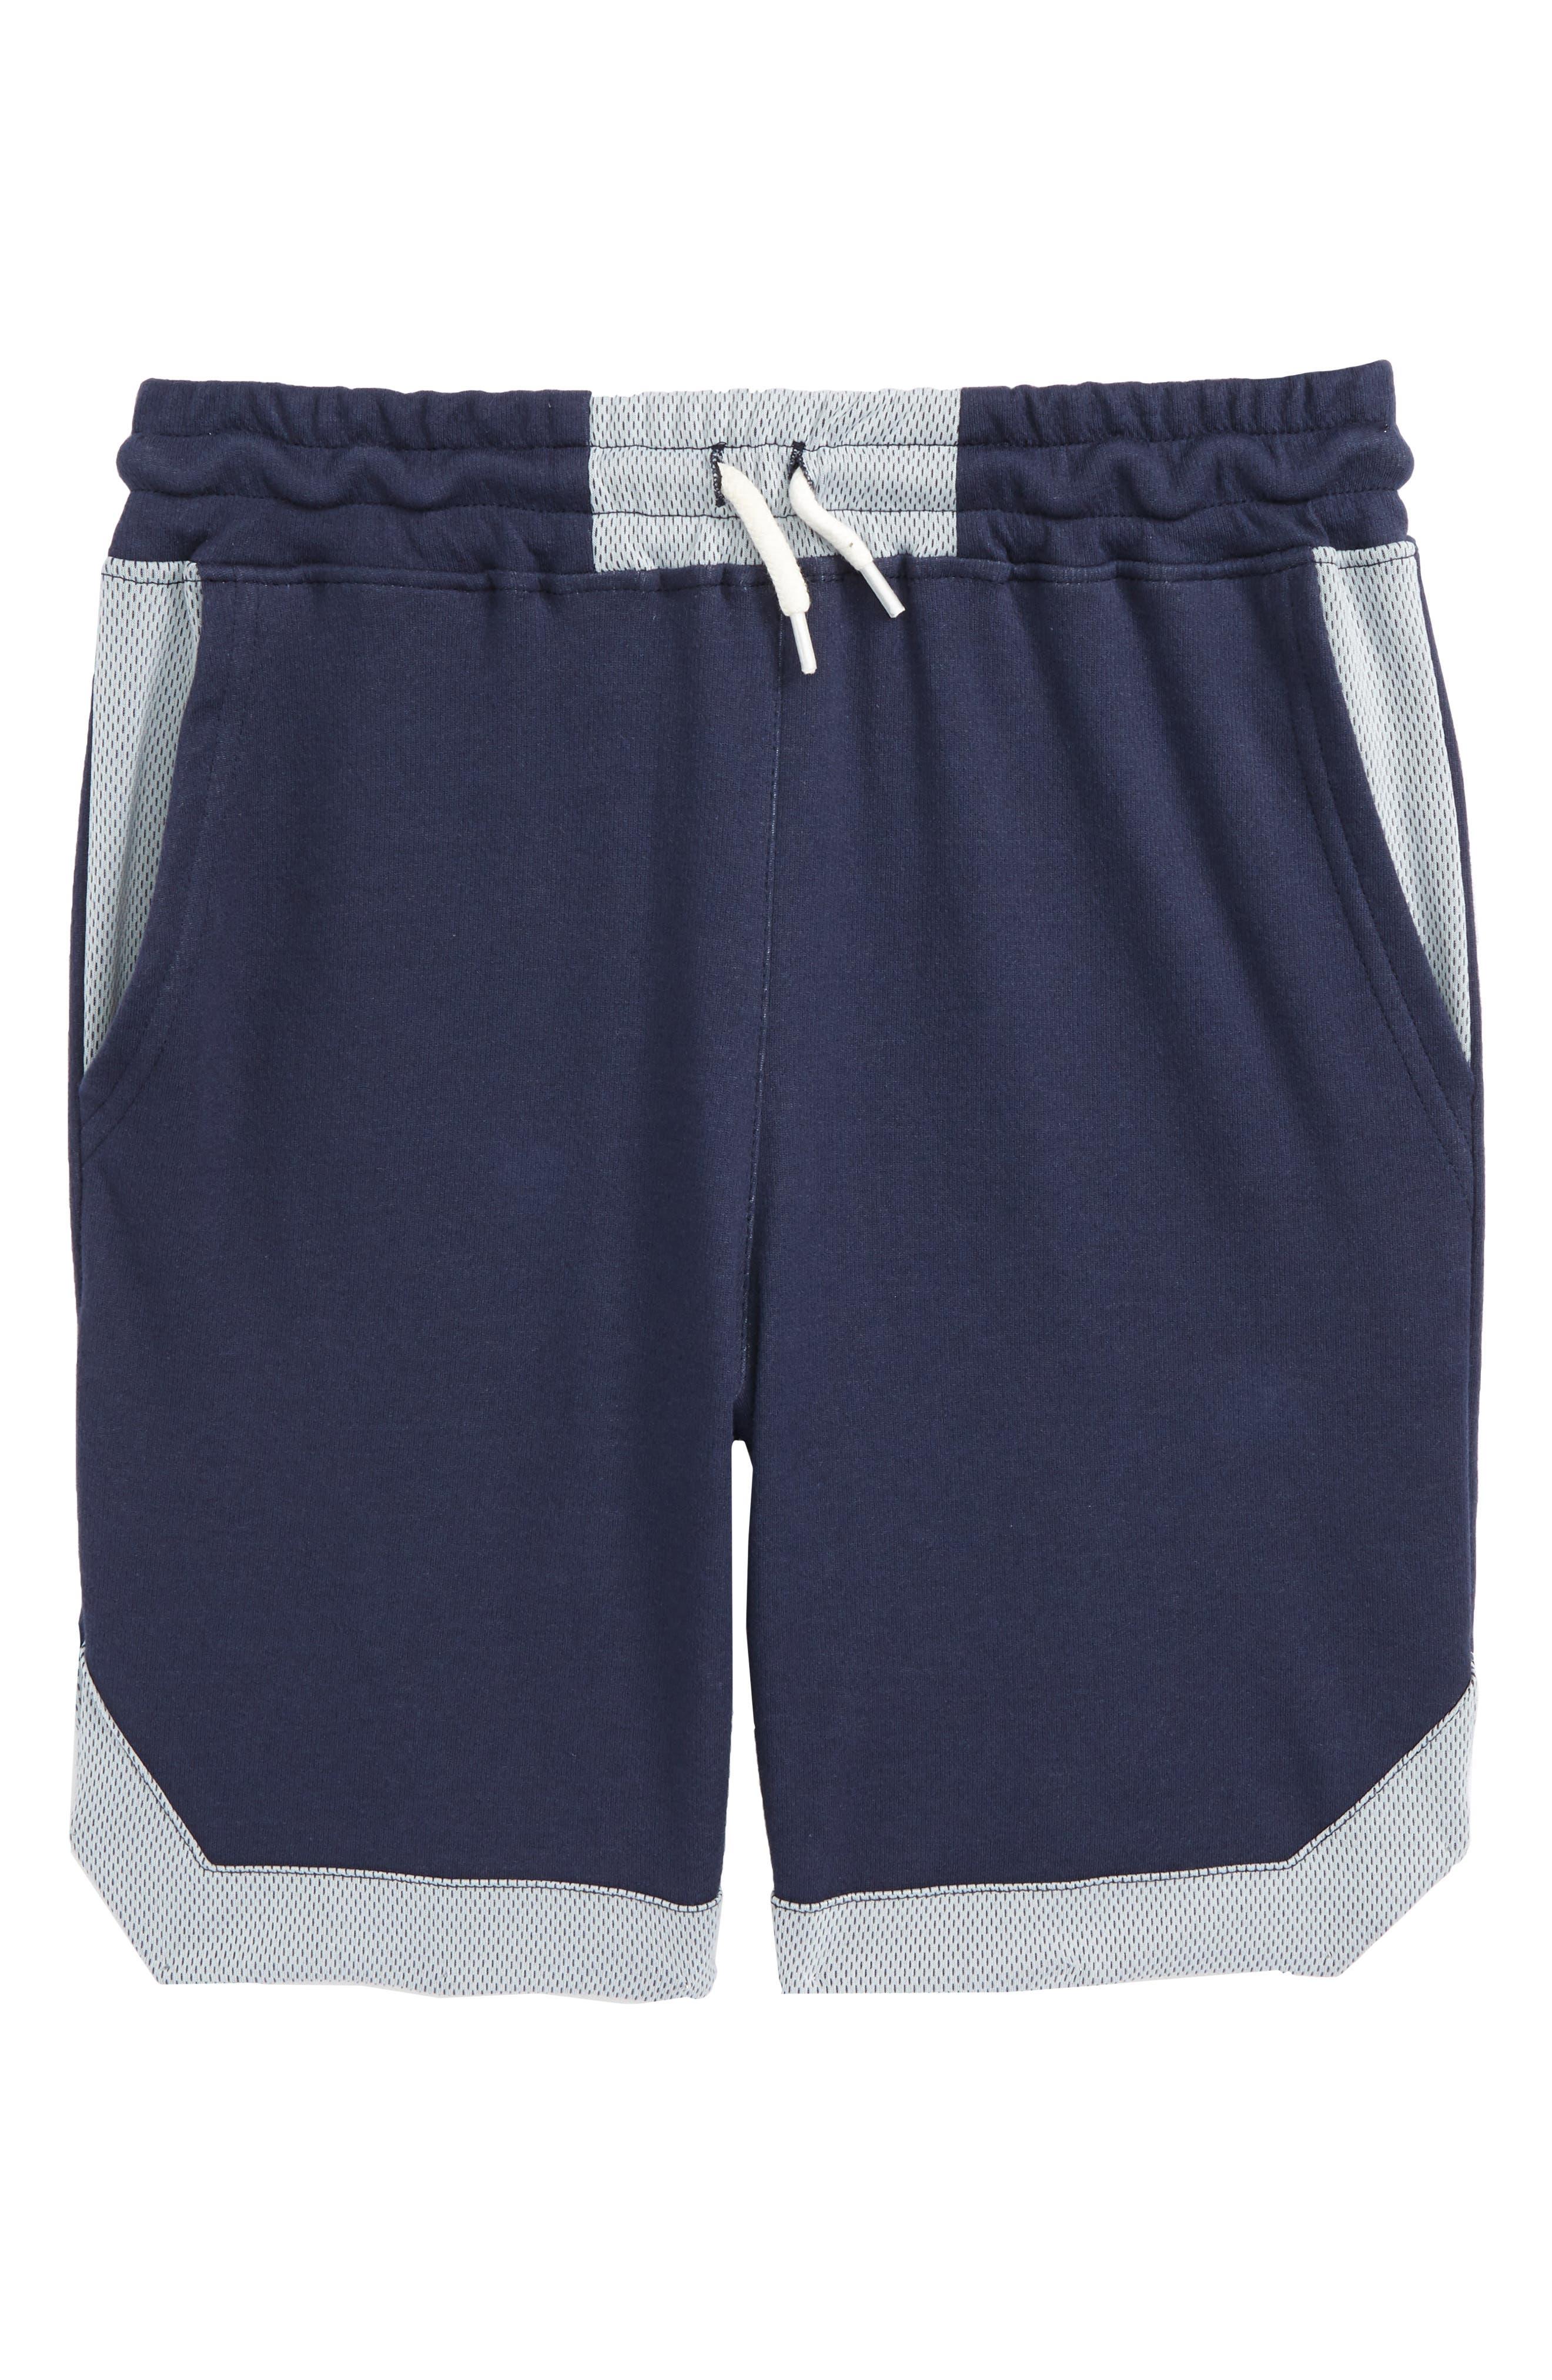 Paneled Shorts,                         Main,                         color, Academy Blue